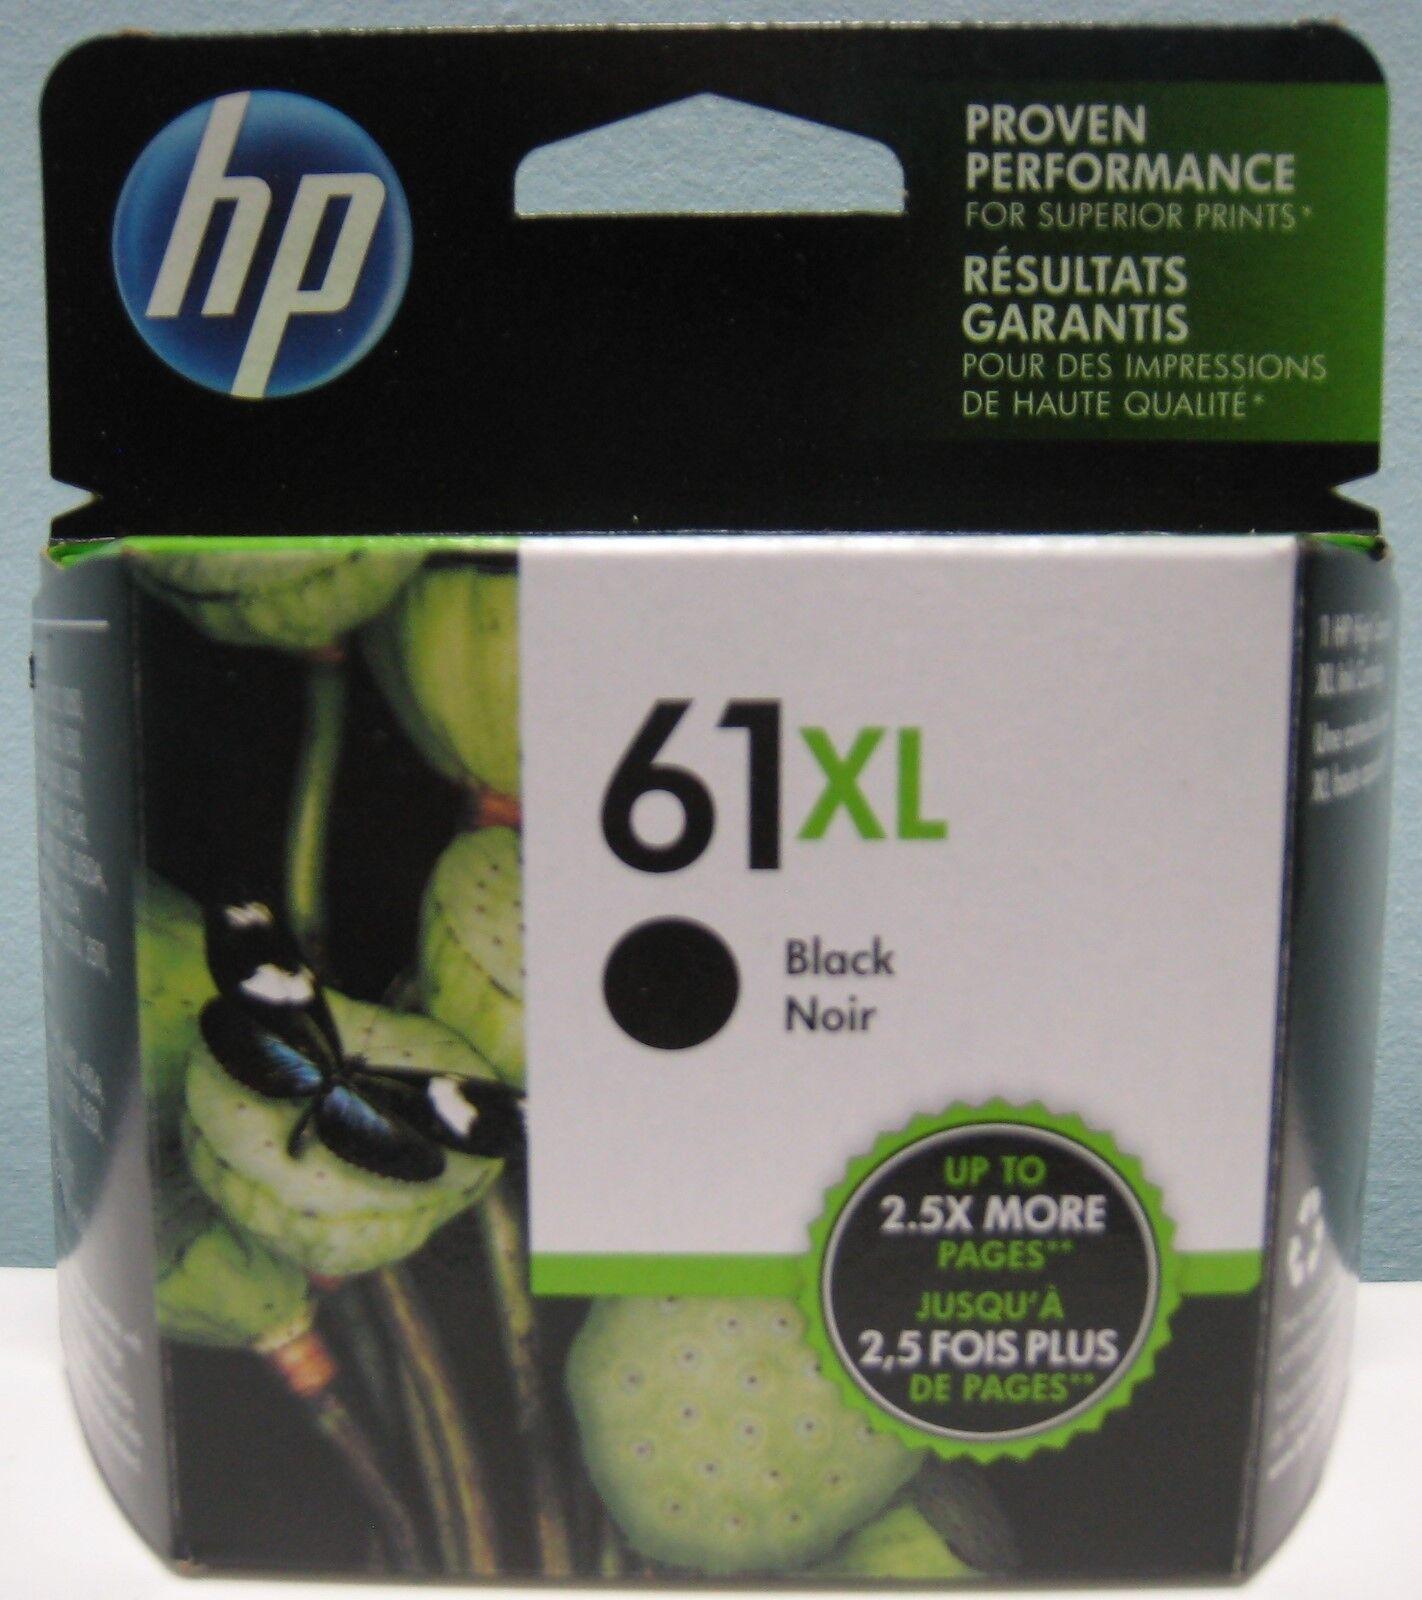 HP 61xl High Yield Genuine Black Ink Cartridge,